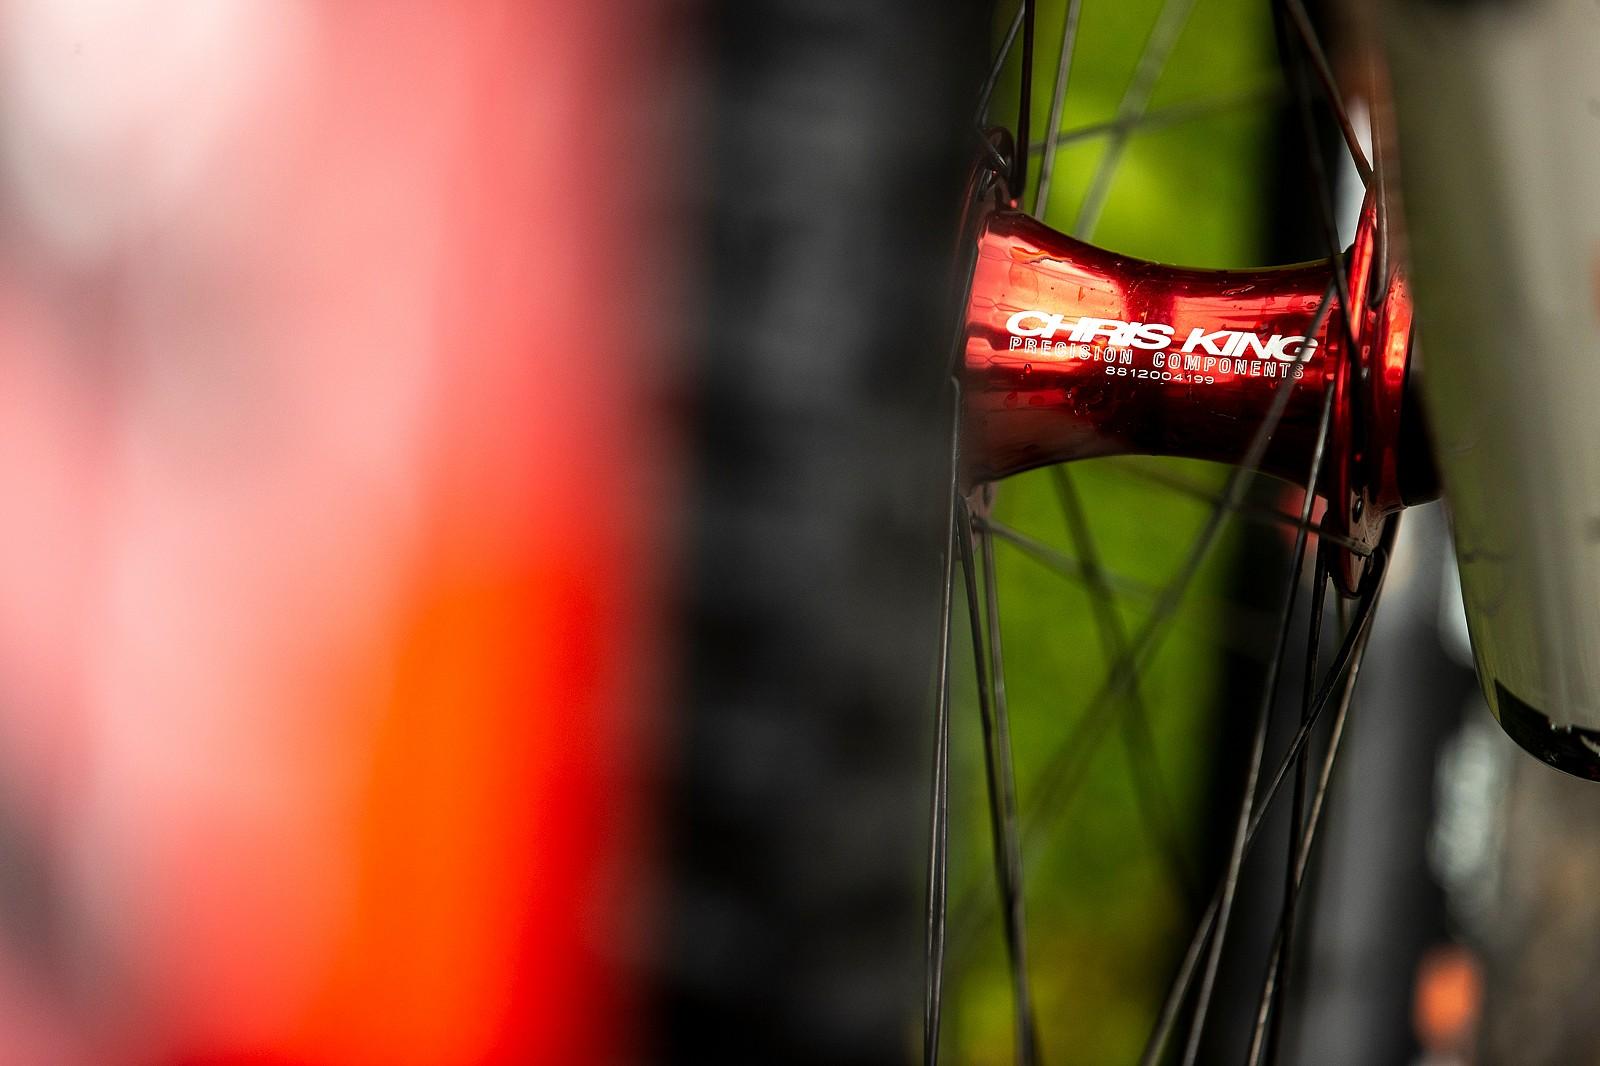 More King of the Bling - WORLD CHAMPS BIKE - Loris Vergier's and Luca Shaw's Santa Cruz V10 - Mountain Biking Pictures - Vital MTB